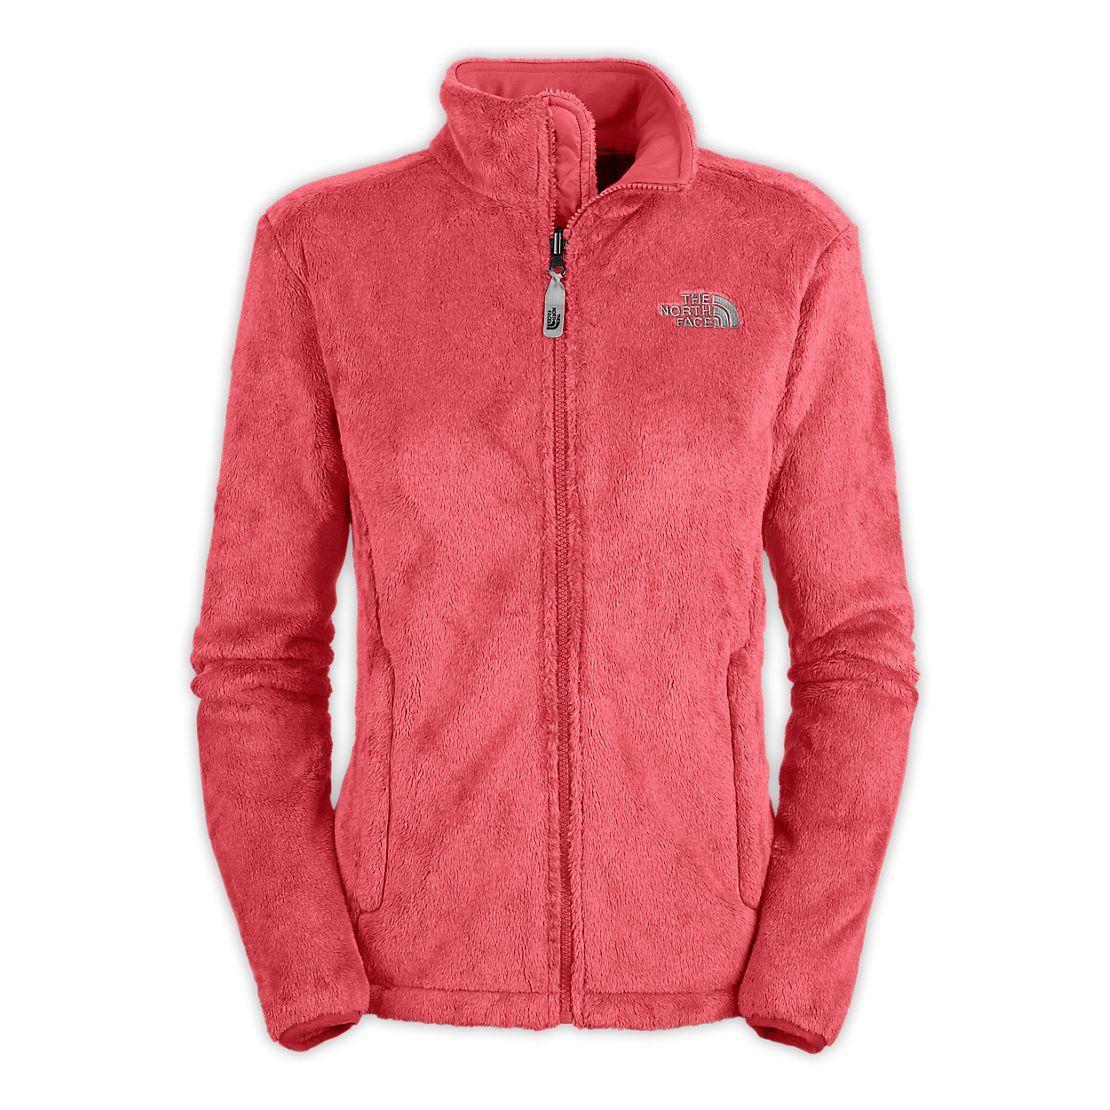 Women S Osito 2 Jacket North Face Fleece Jacket Jackets For Women North Face Jacket [ 1110 x 1110 Pixel ]